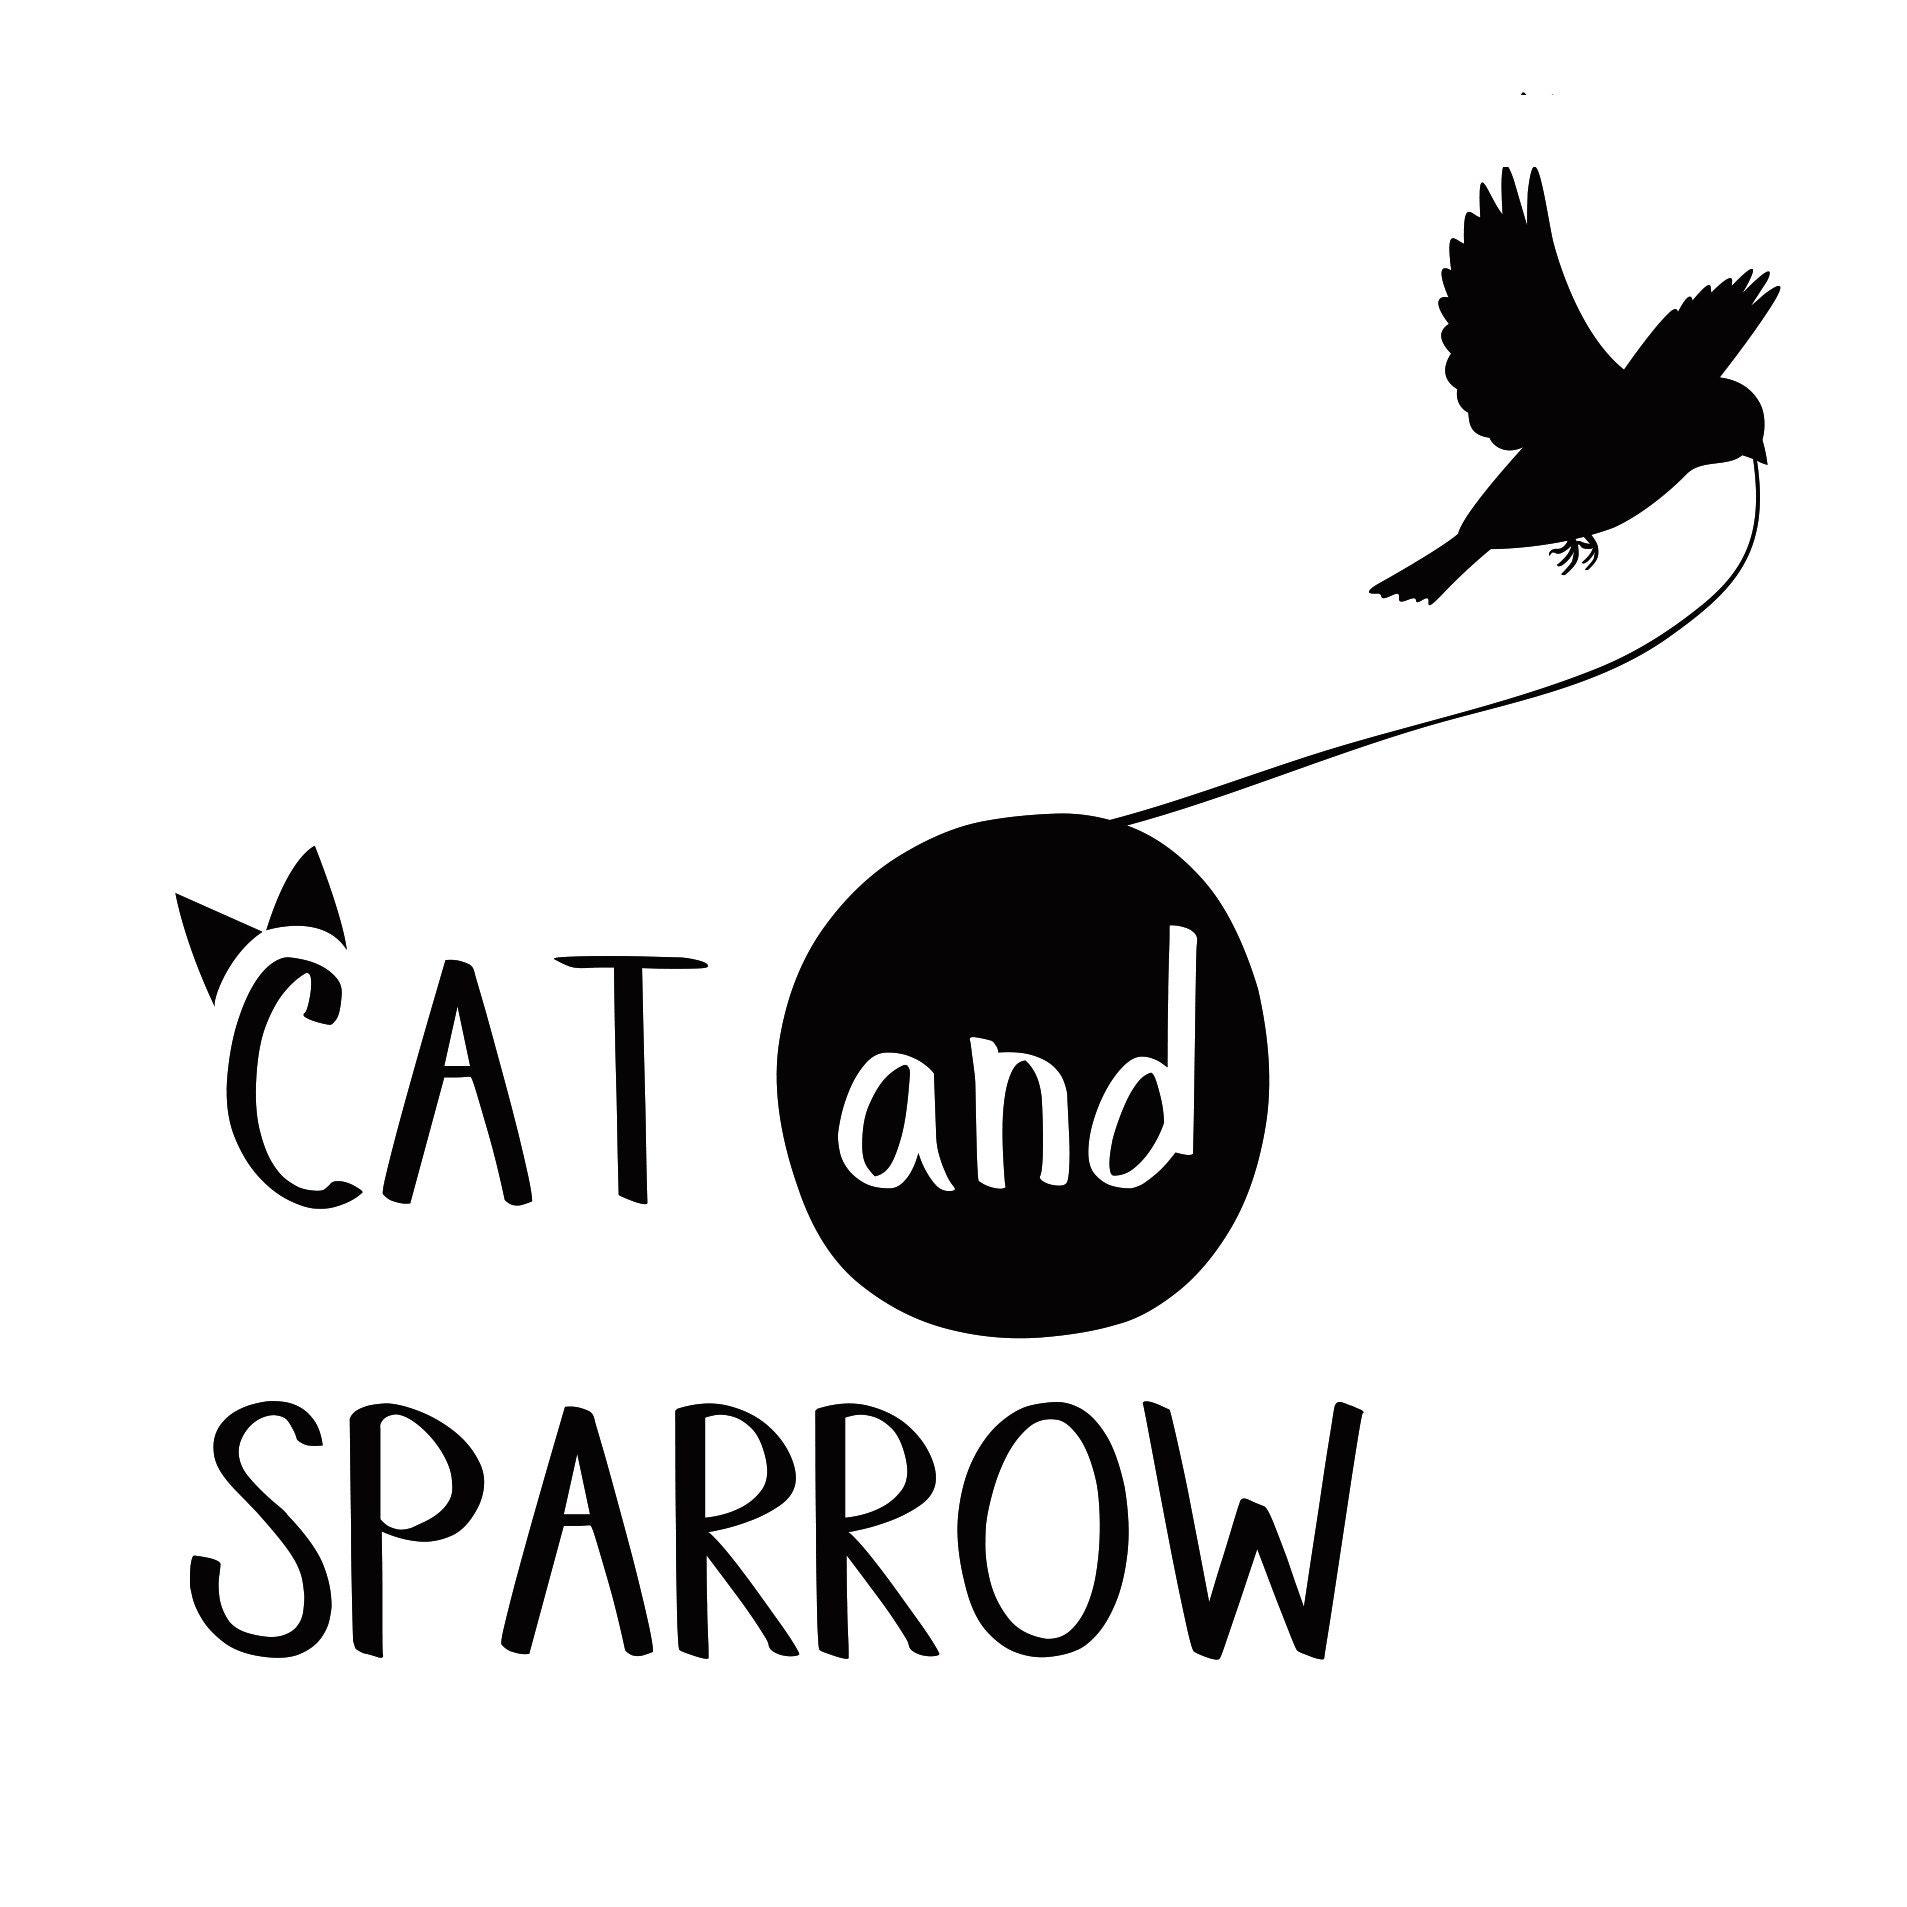 CatandSparrowFibres